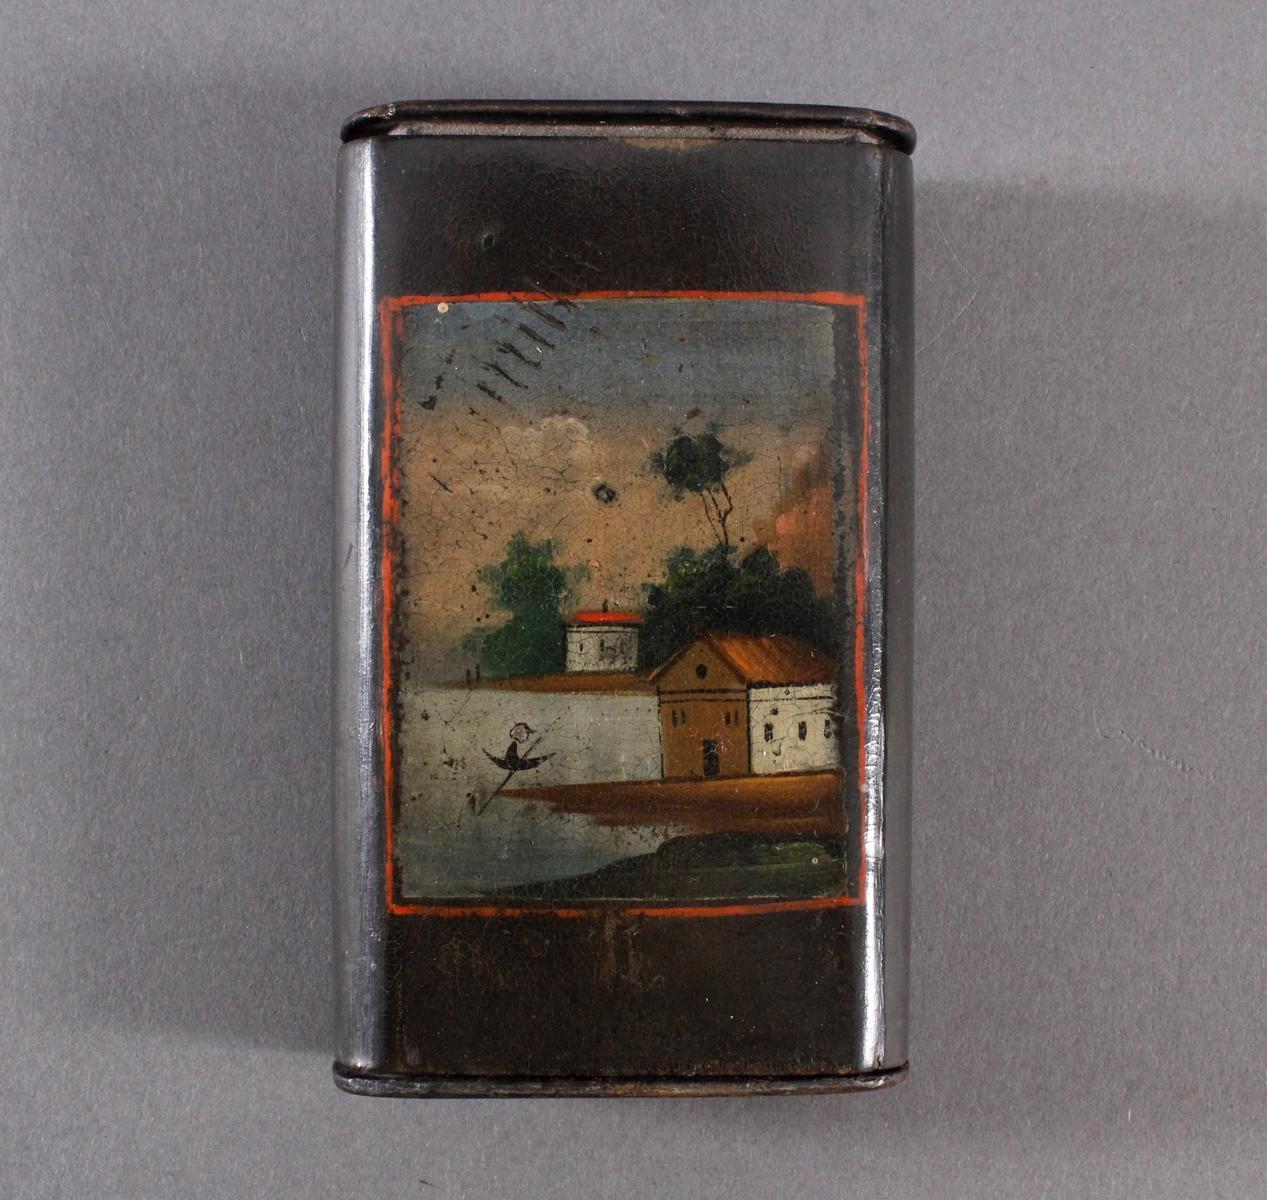 Zigarettenetui, Art Stobwasser 19. Jh.